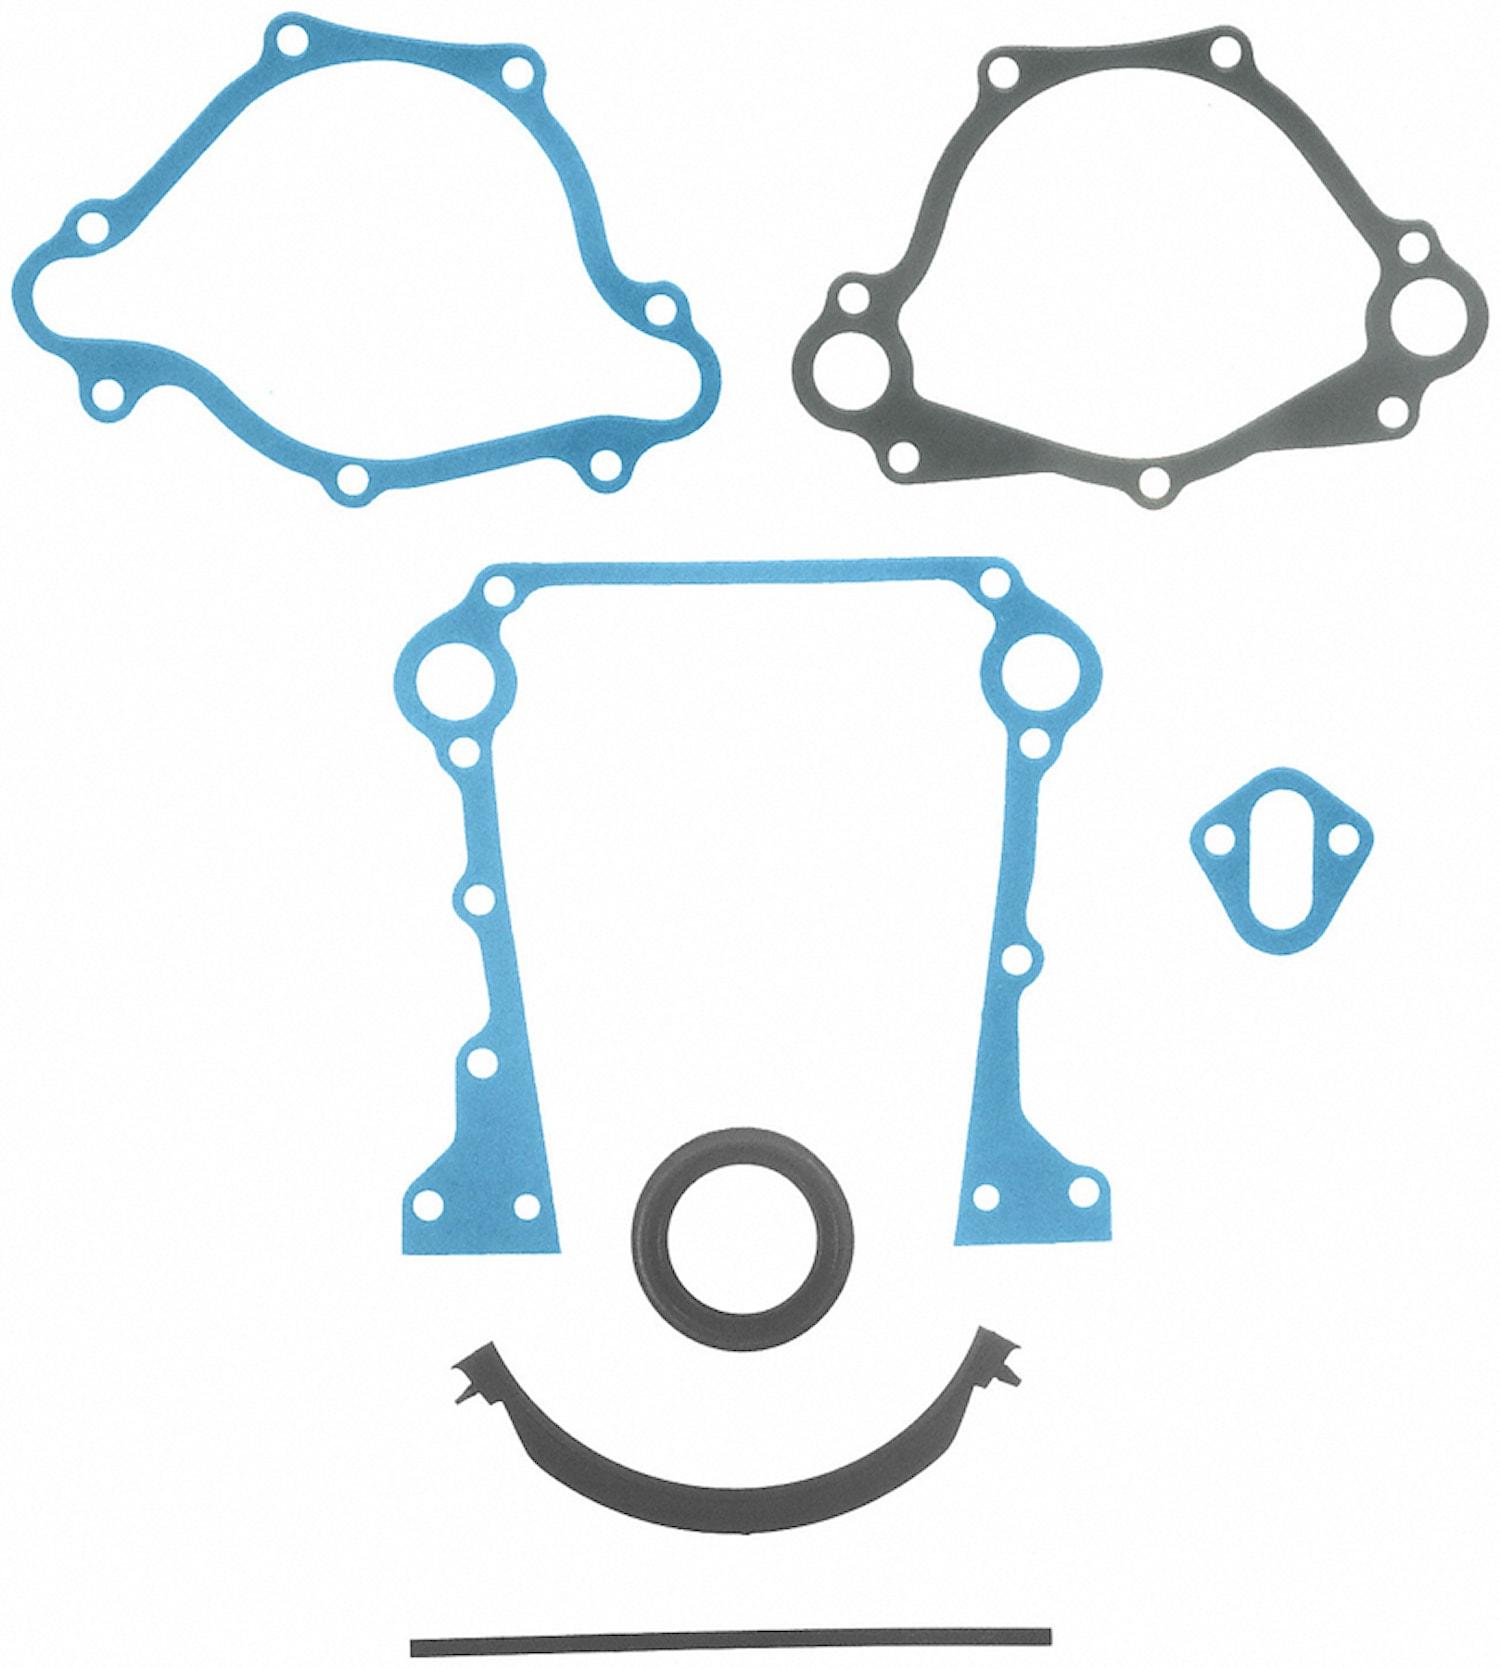 Tcs-set/Mop sb